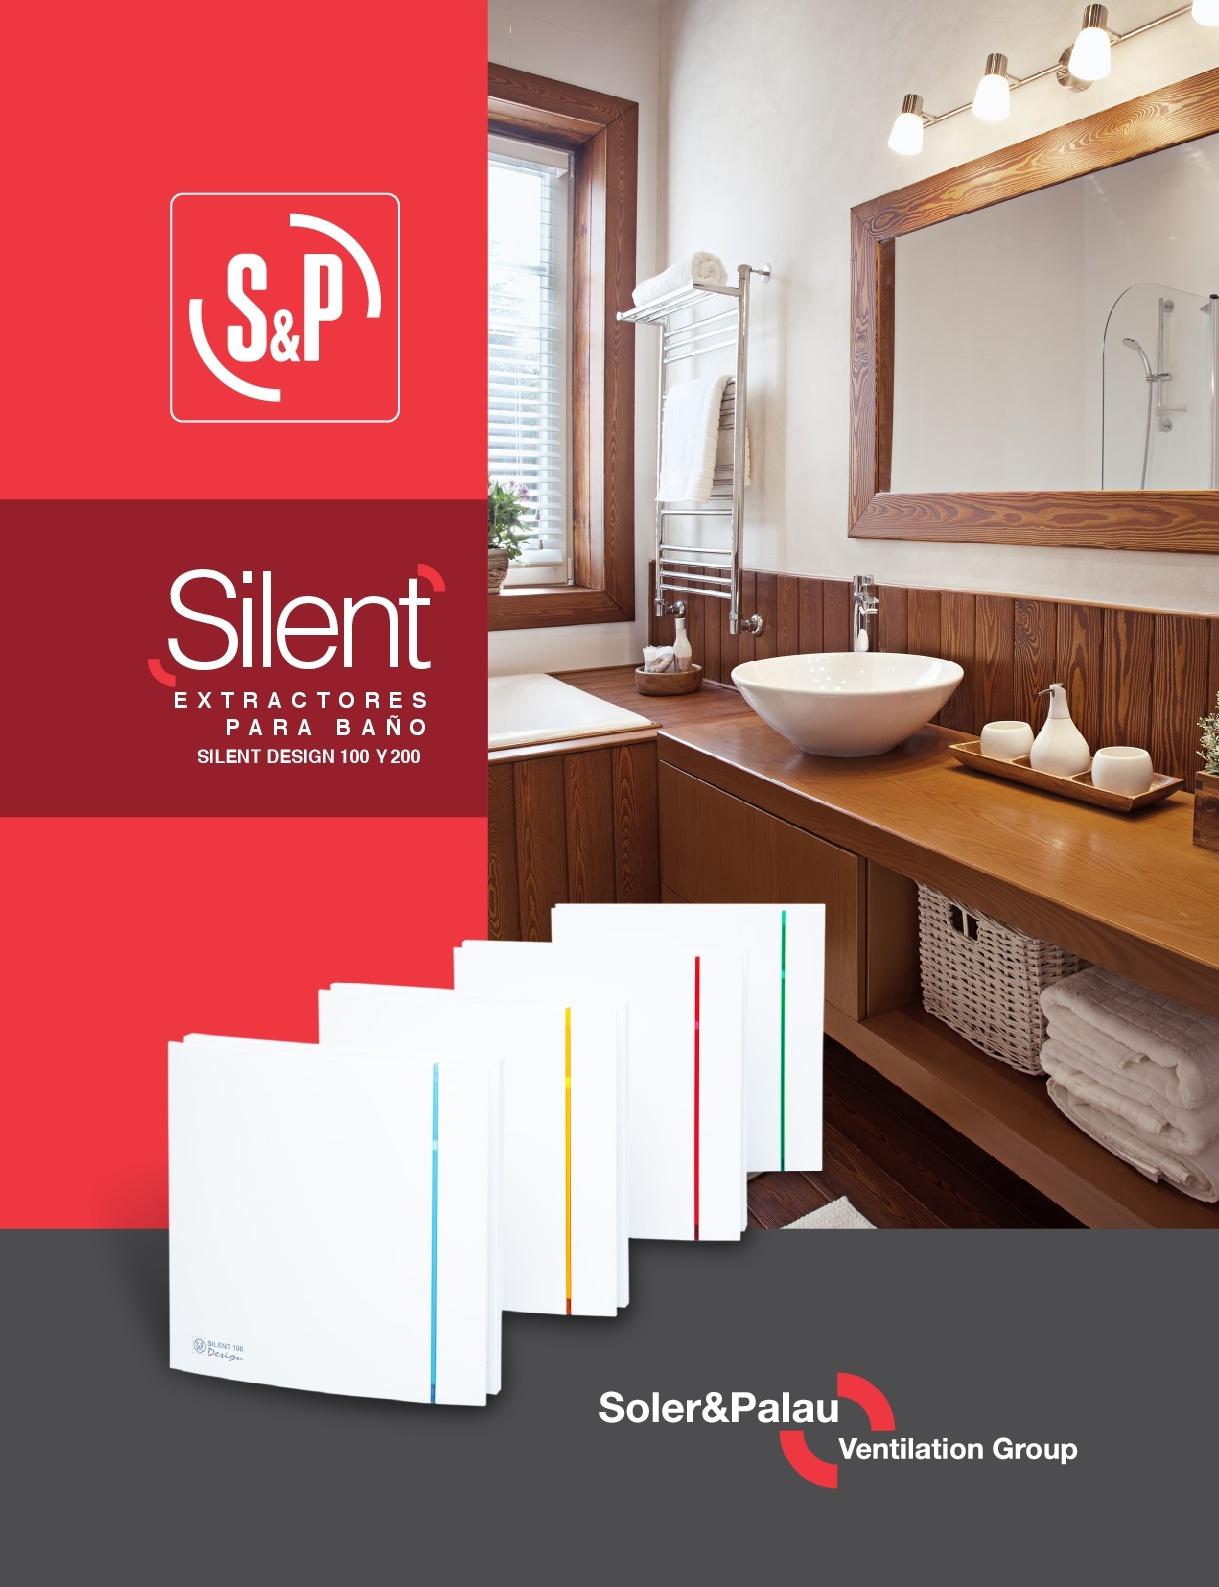 Lanz-SILENT-design-S&P-001